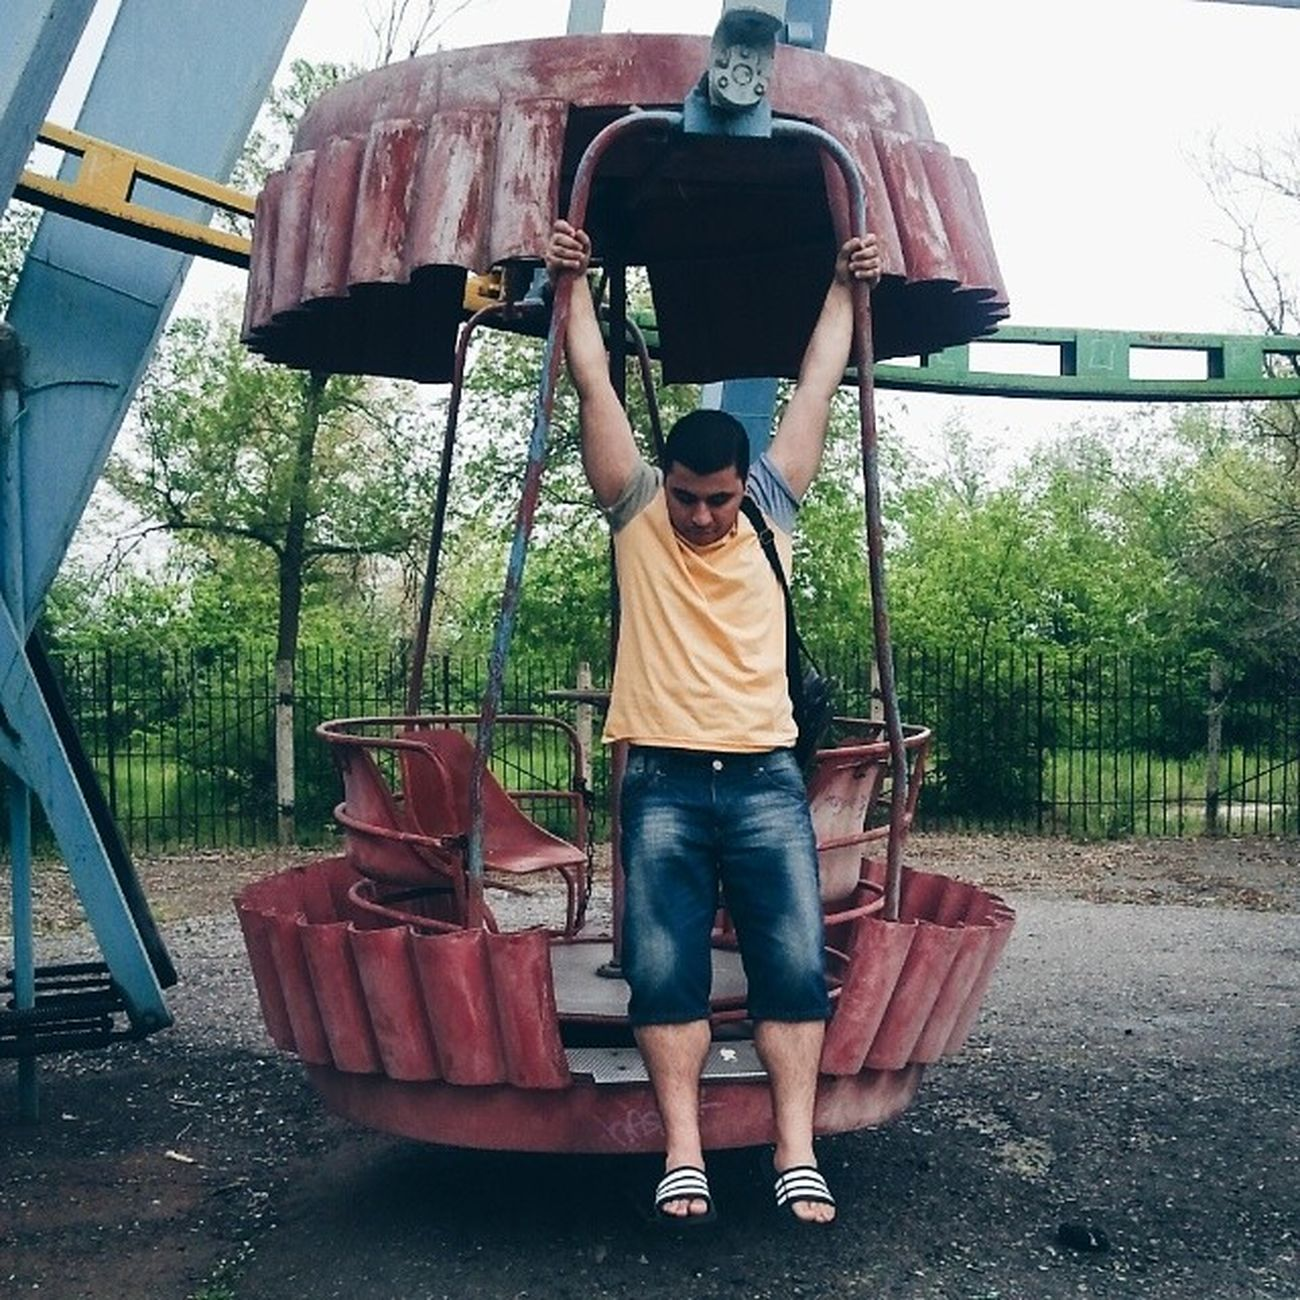 заброшенное колесообозрения паркдружбы вишу snapseed Ferriswheel vsco vscorussia vscocam vscophile vscogood vscoaward instagood vscogrid vscomoment VolgogradCity Volgograd